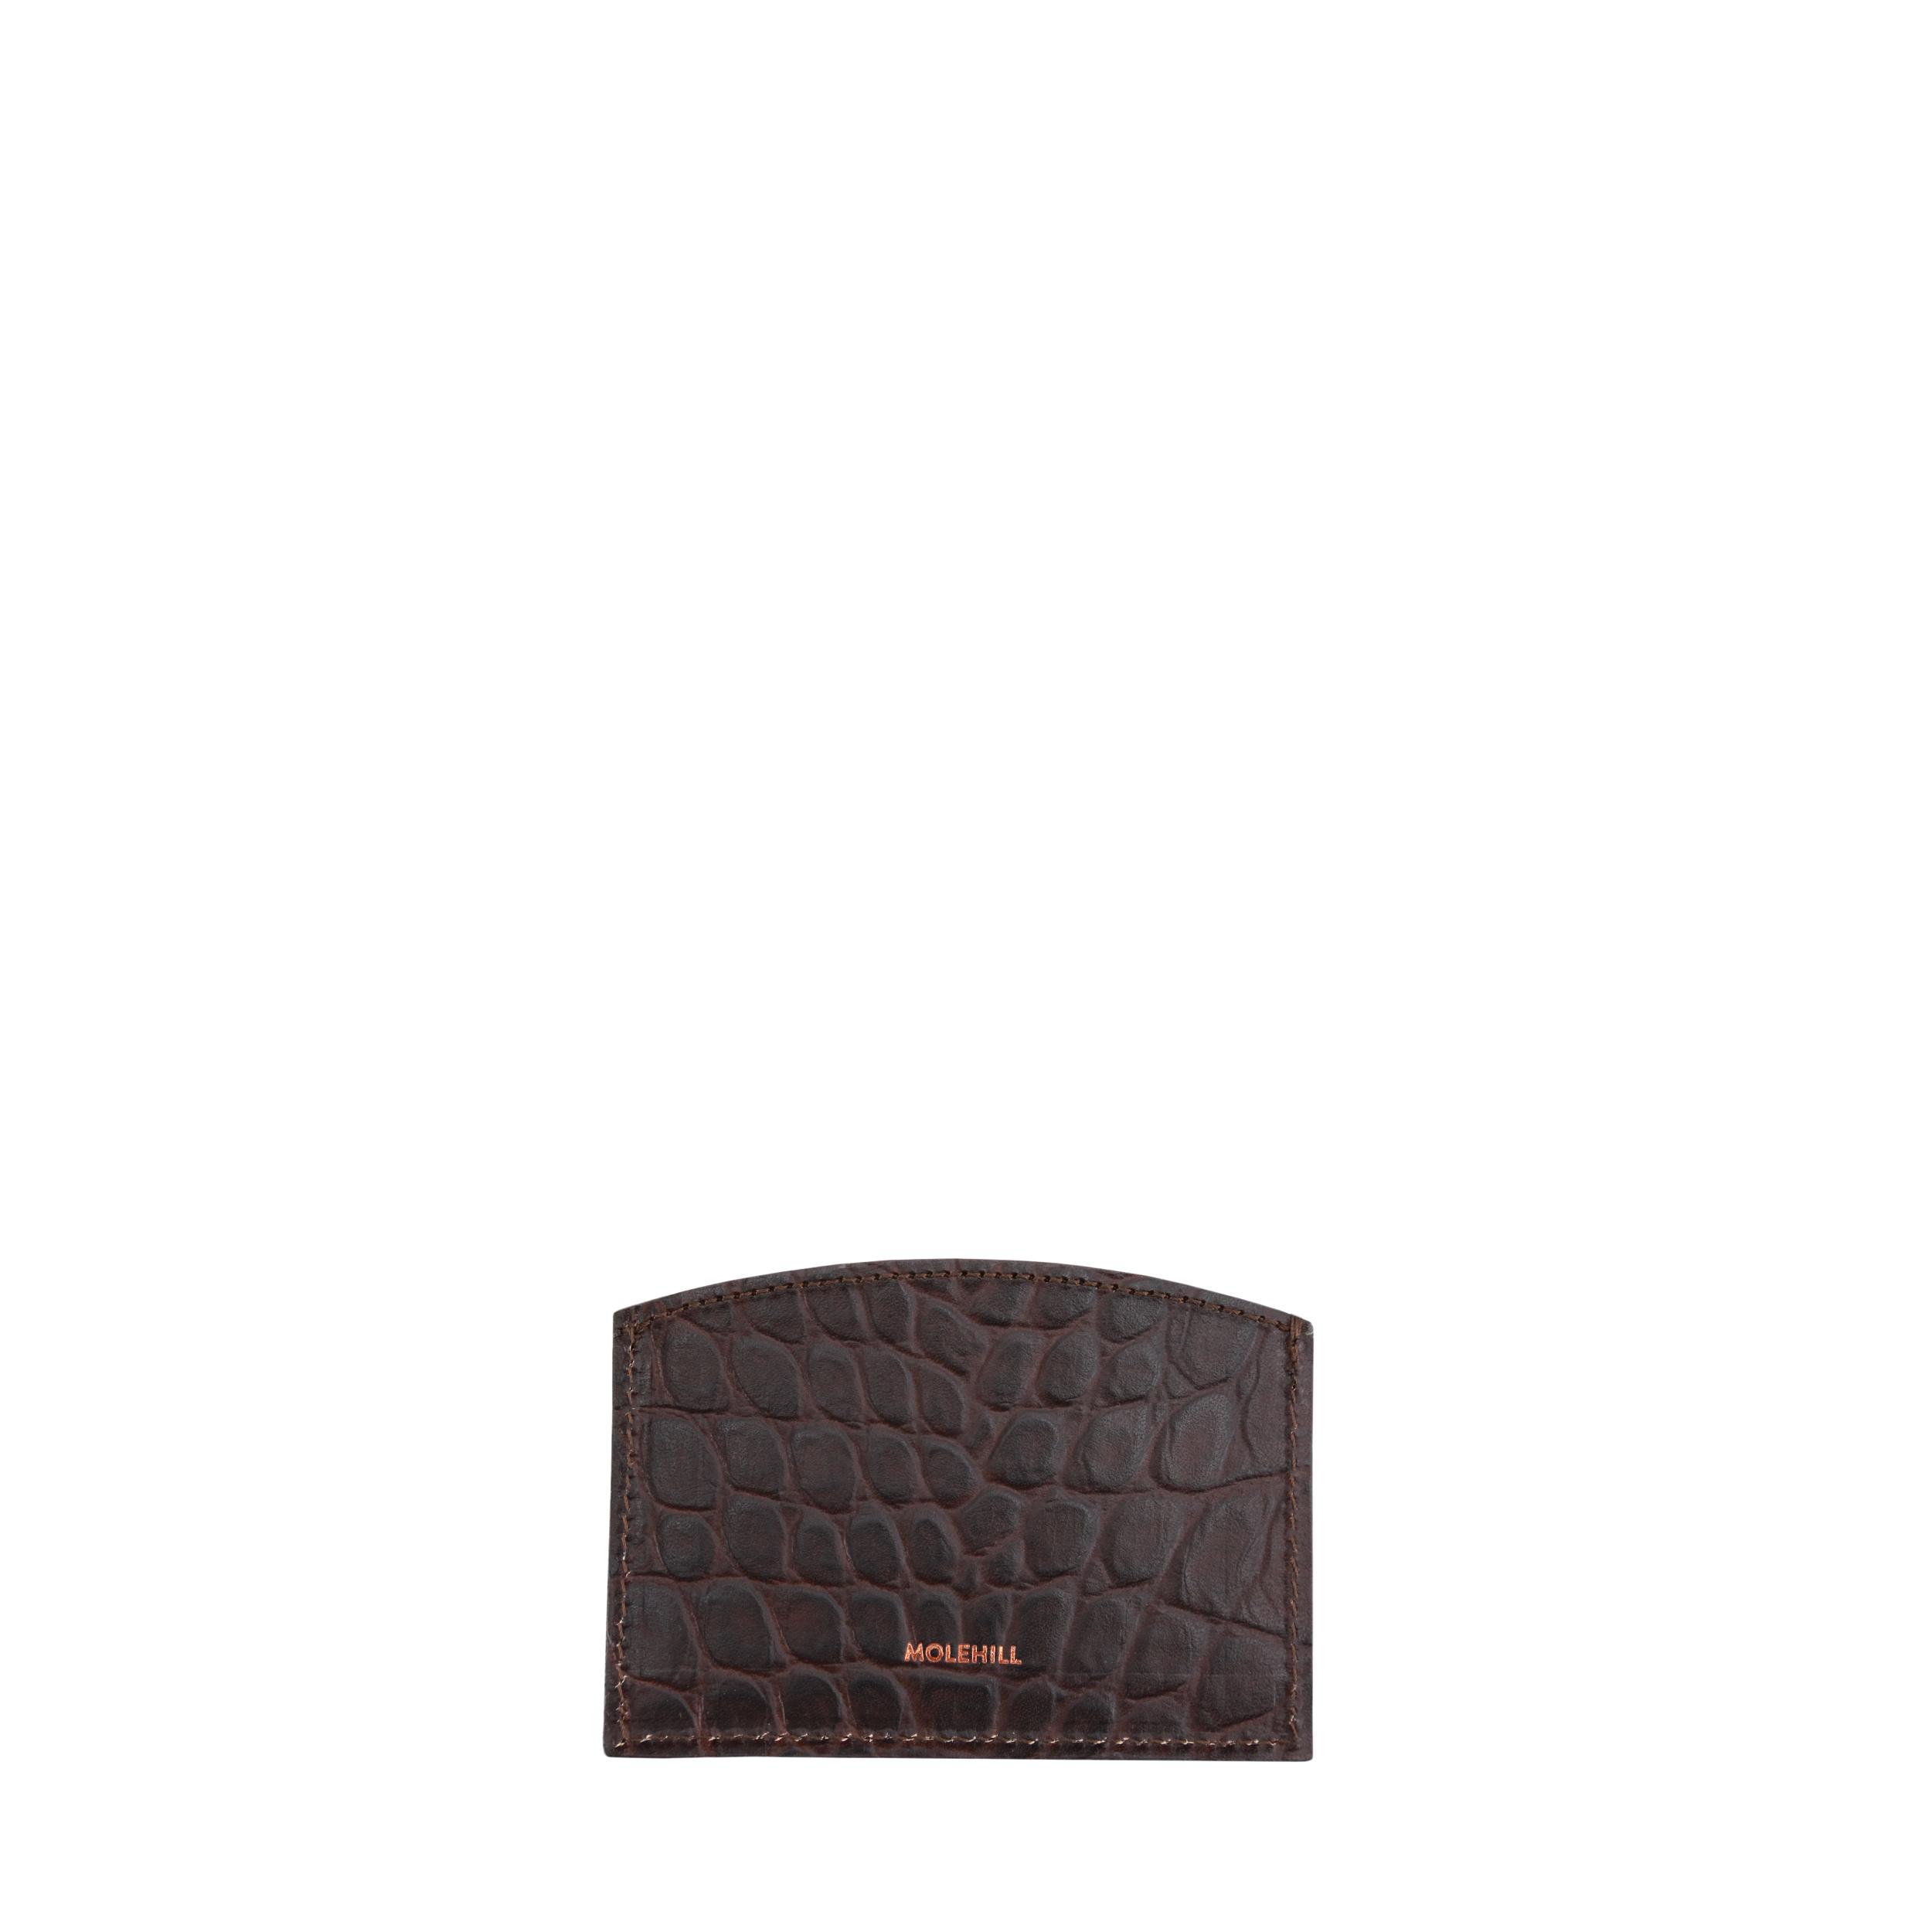 Card-Holder-Croco-Brown-Special-Edition-1